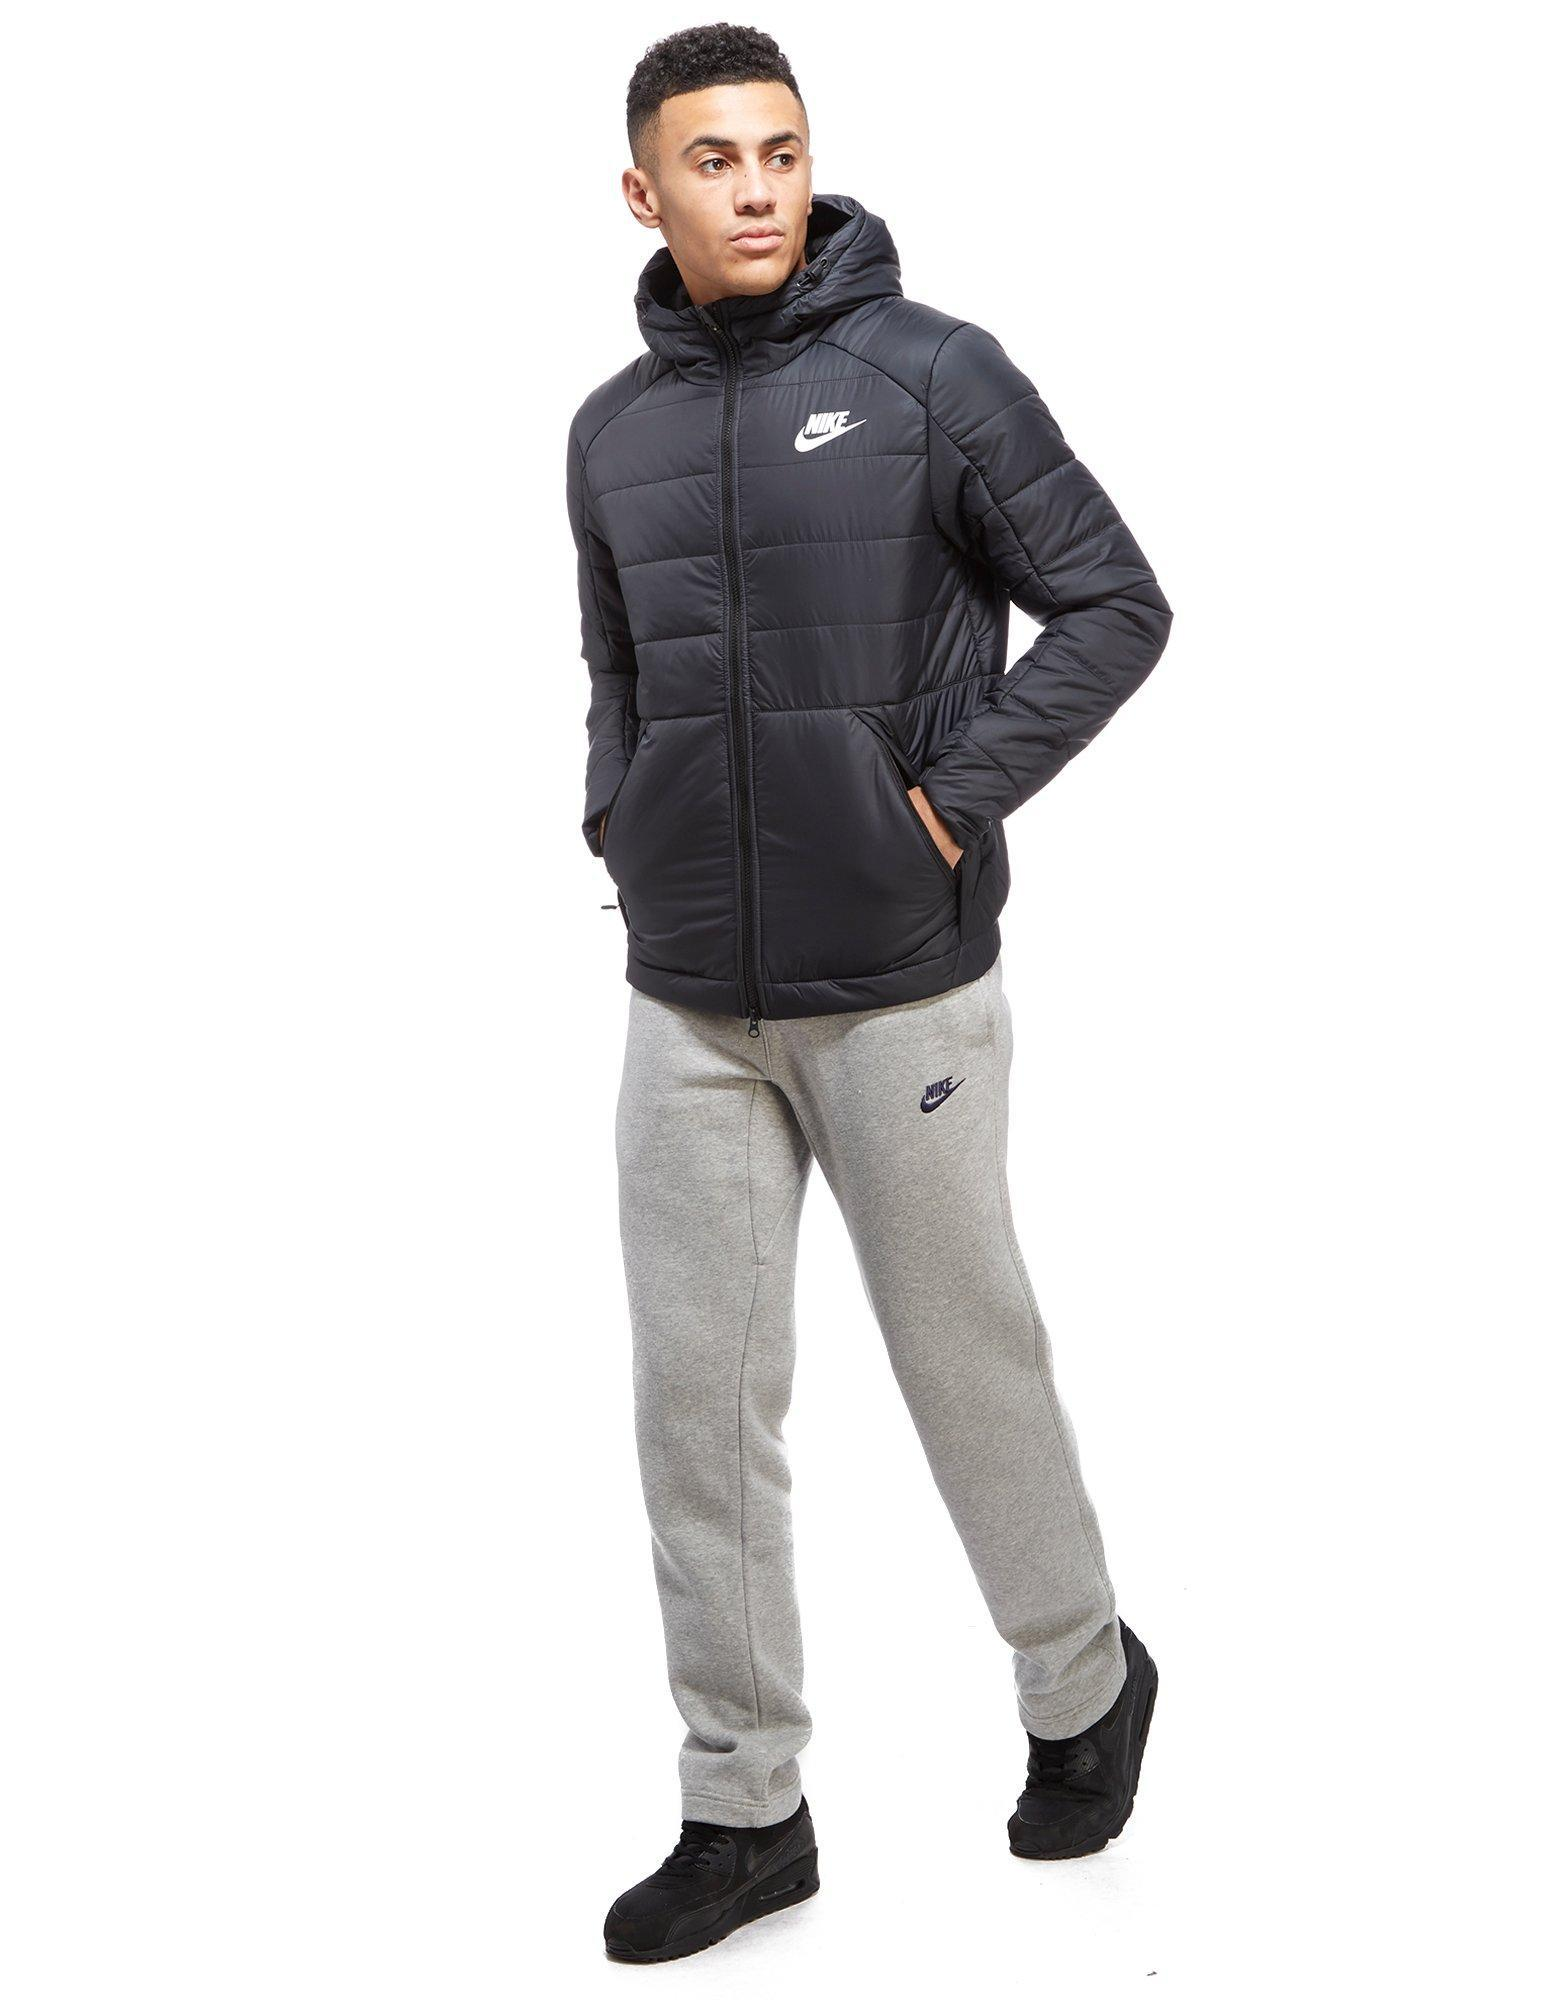 8008a0d6d883 Black In Lyst Jacket Bubble For Men Nike tWqfI